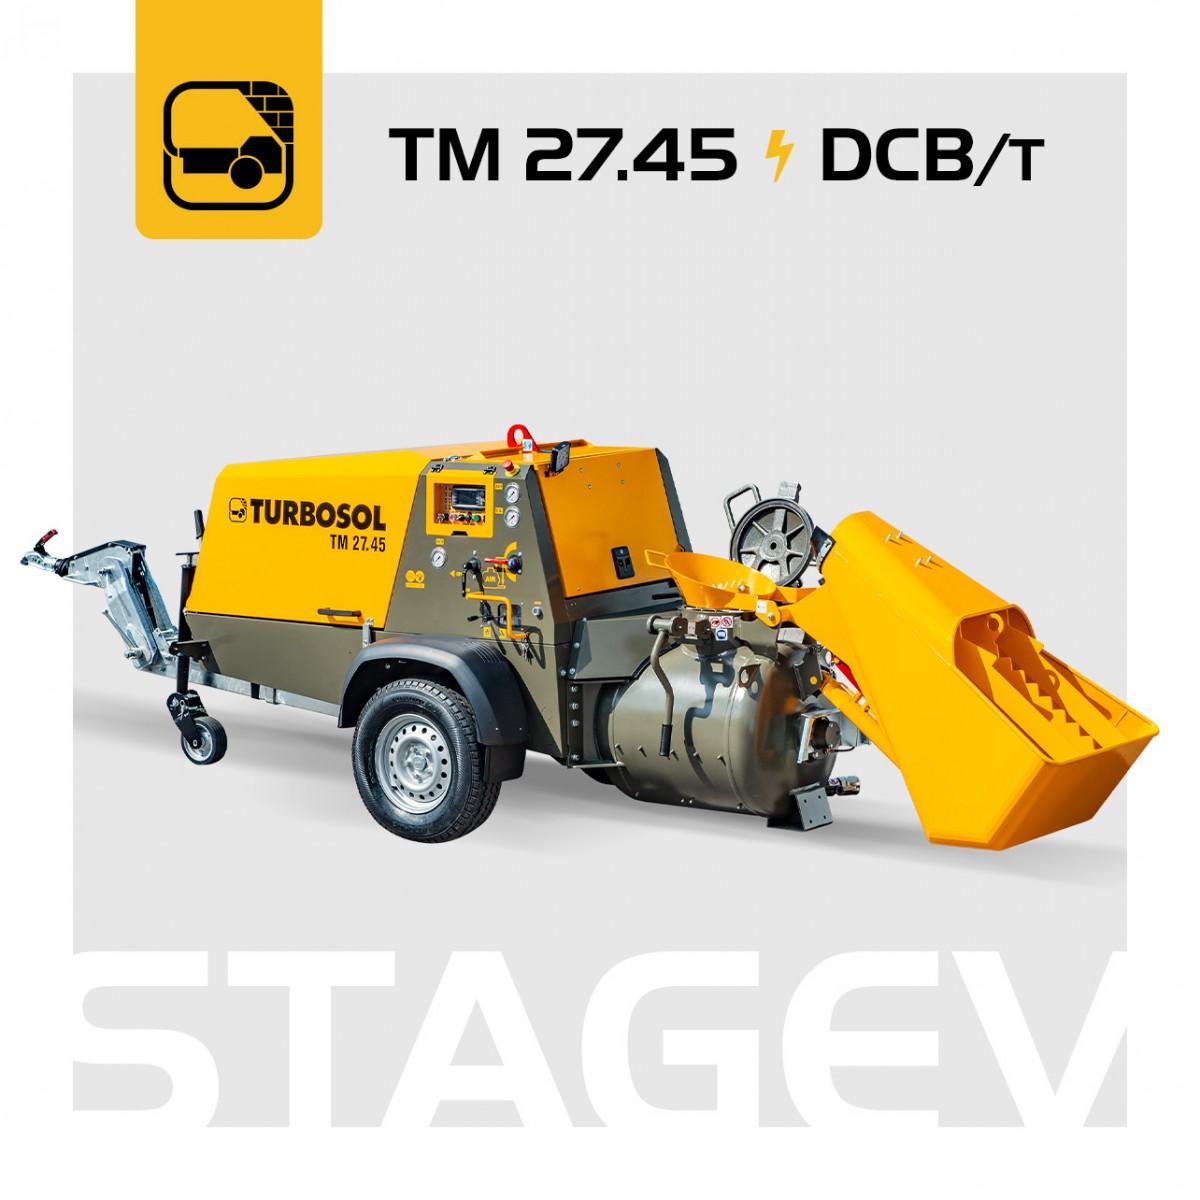 Transmat 27.45 DCB/T - Stage V